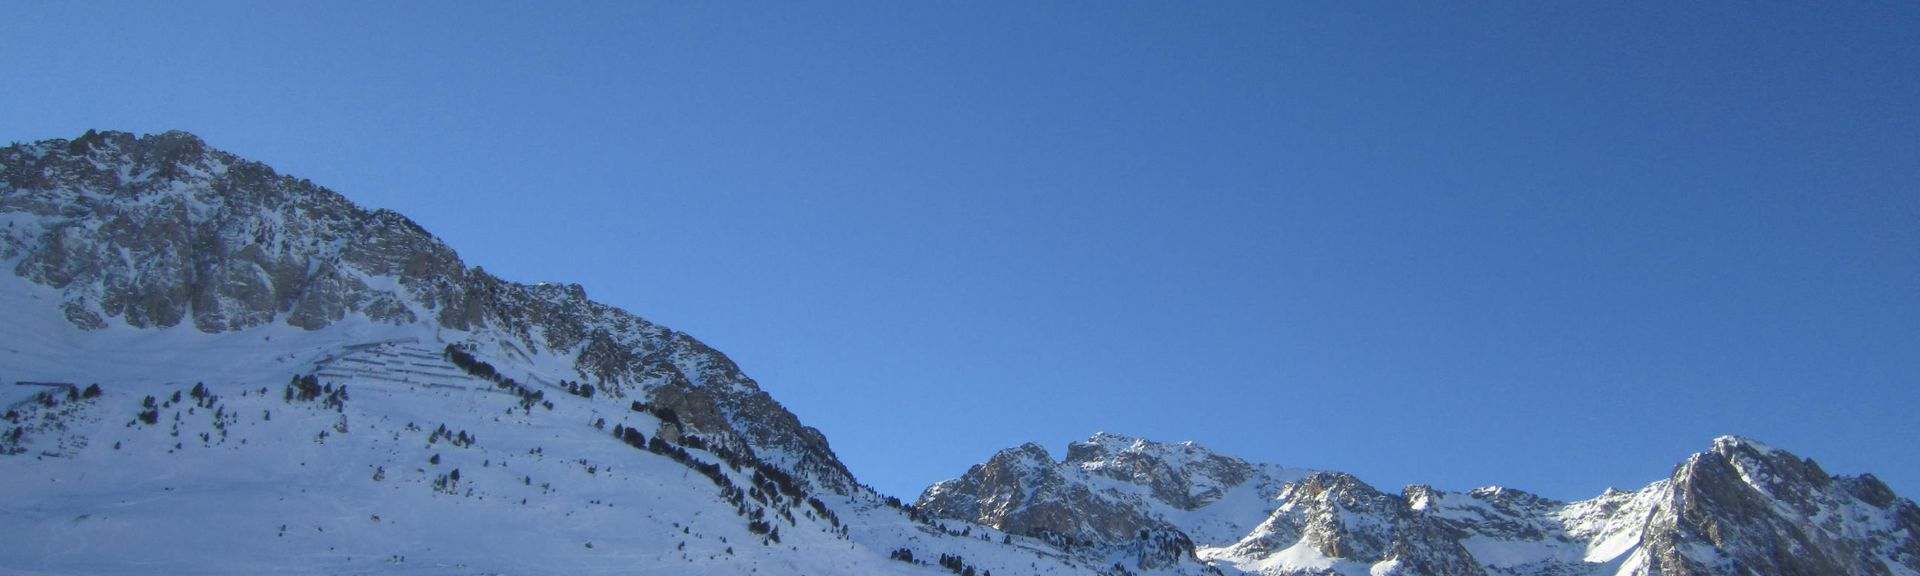 Saligos, Hautes-Pyrenees, France